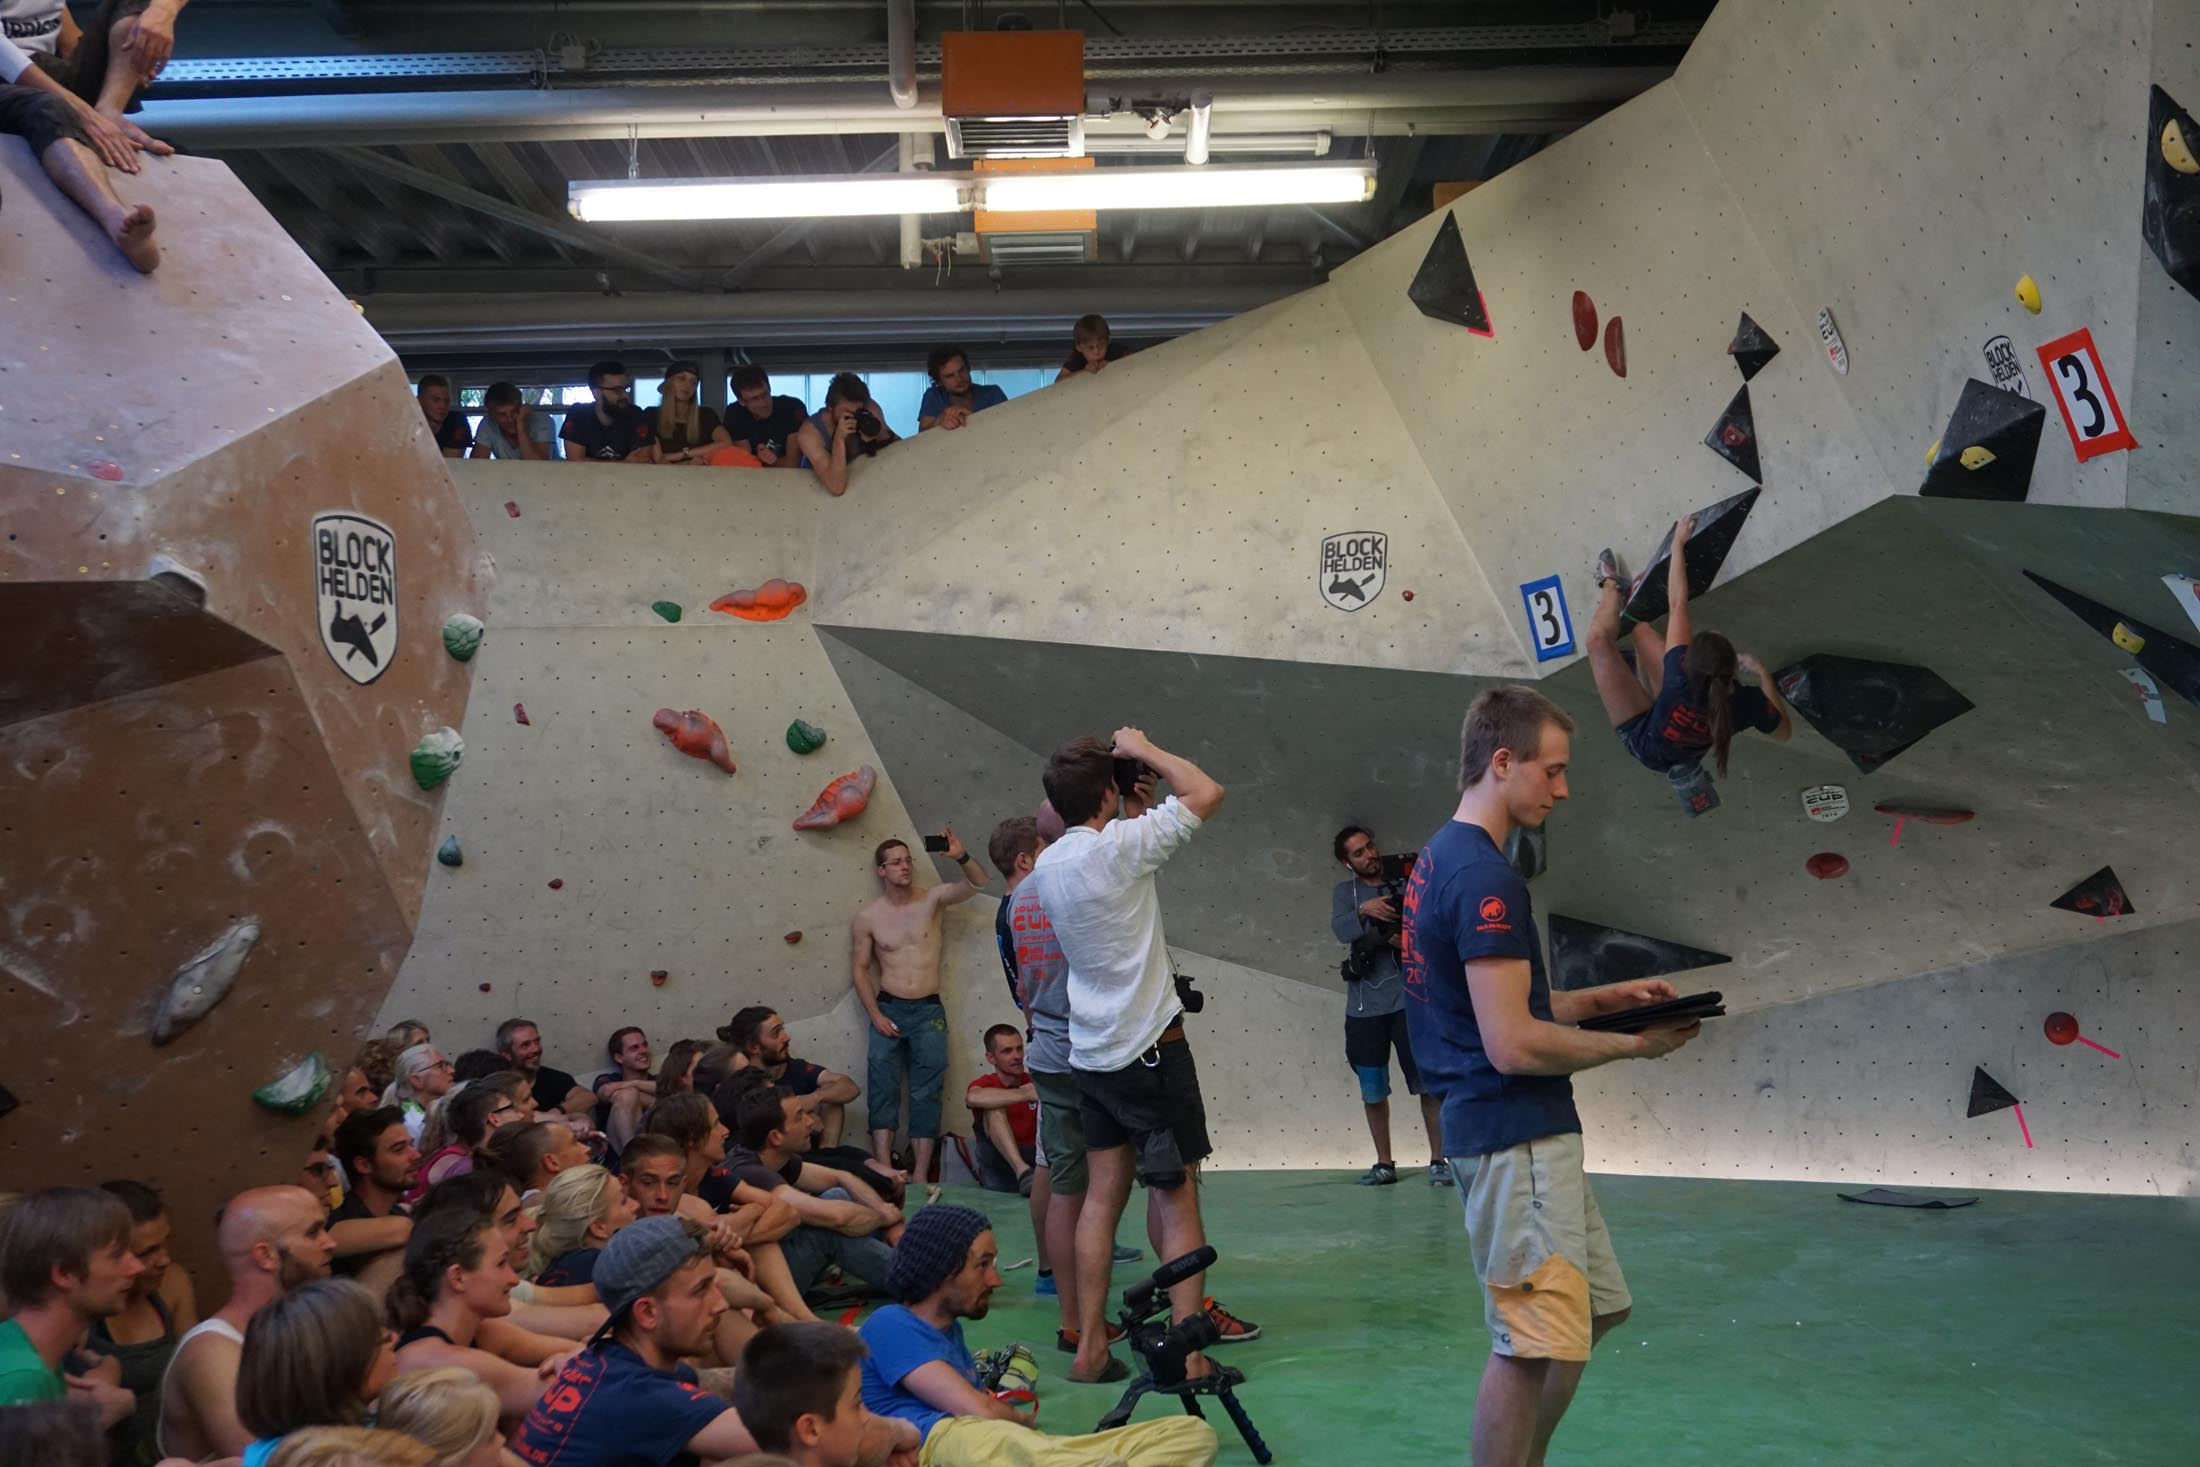 Finale, internationaler bouldercup Frankenjura 2016, BLOCKHELDEN Erlangen, Mammut, Bergfreunde.de, Boulderwettkampf07092016687